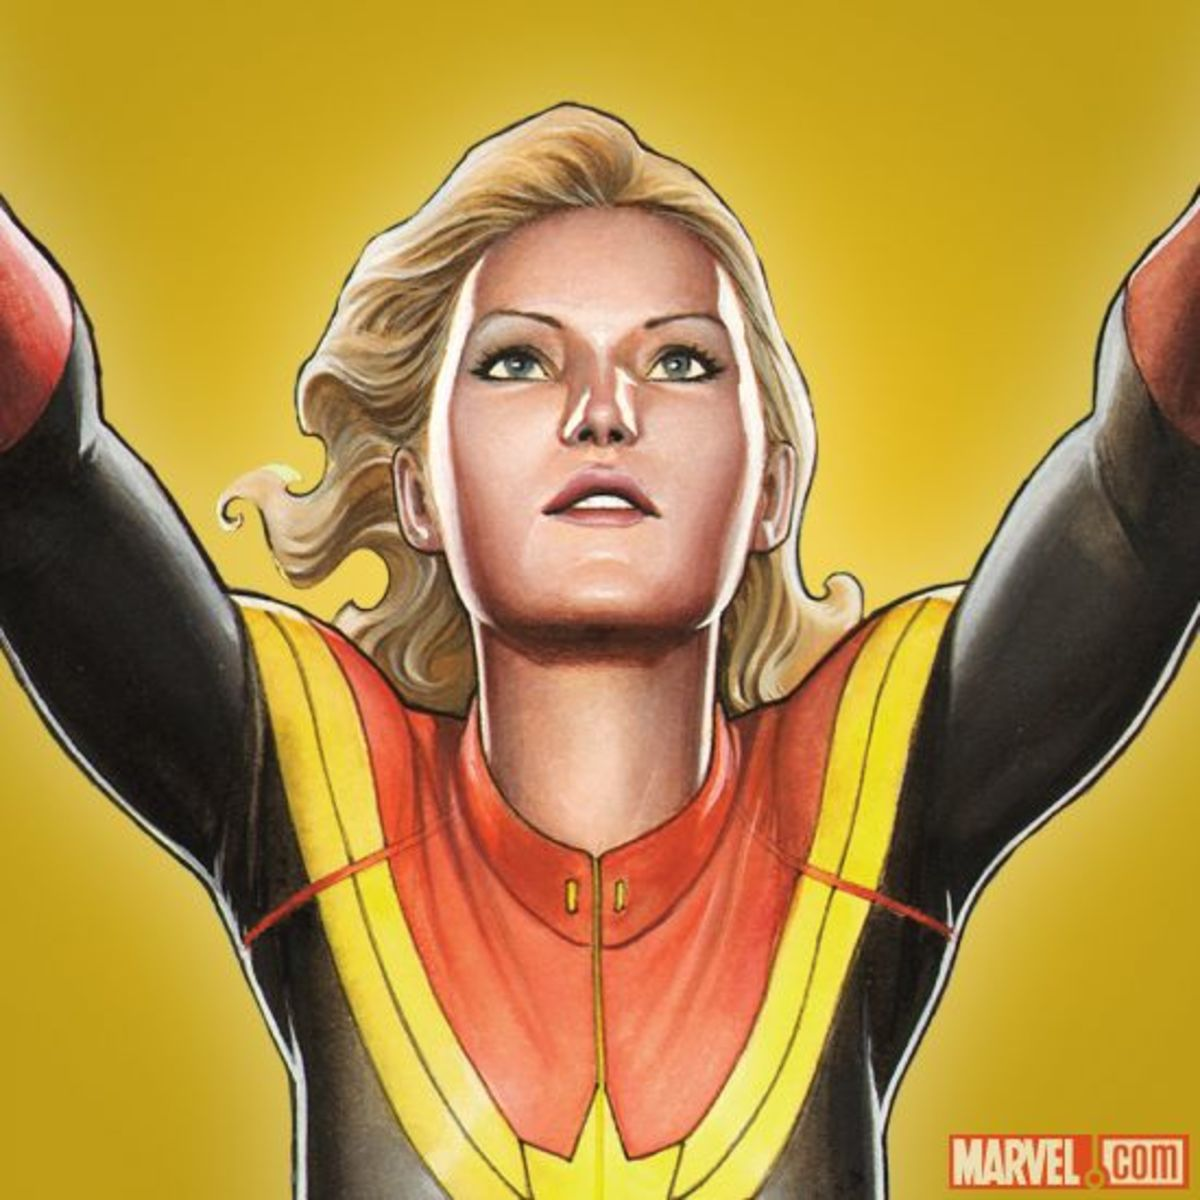 superhero-costume-ideas-for-women